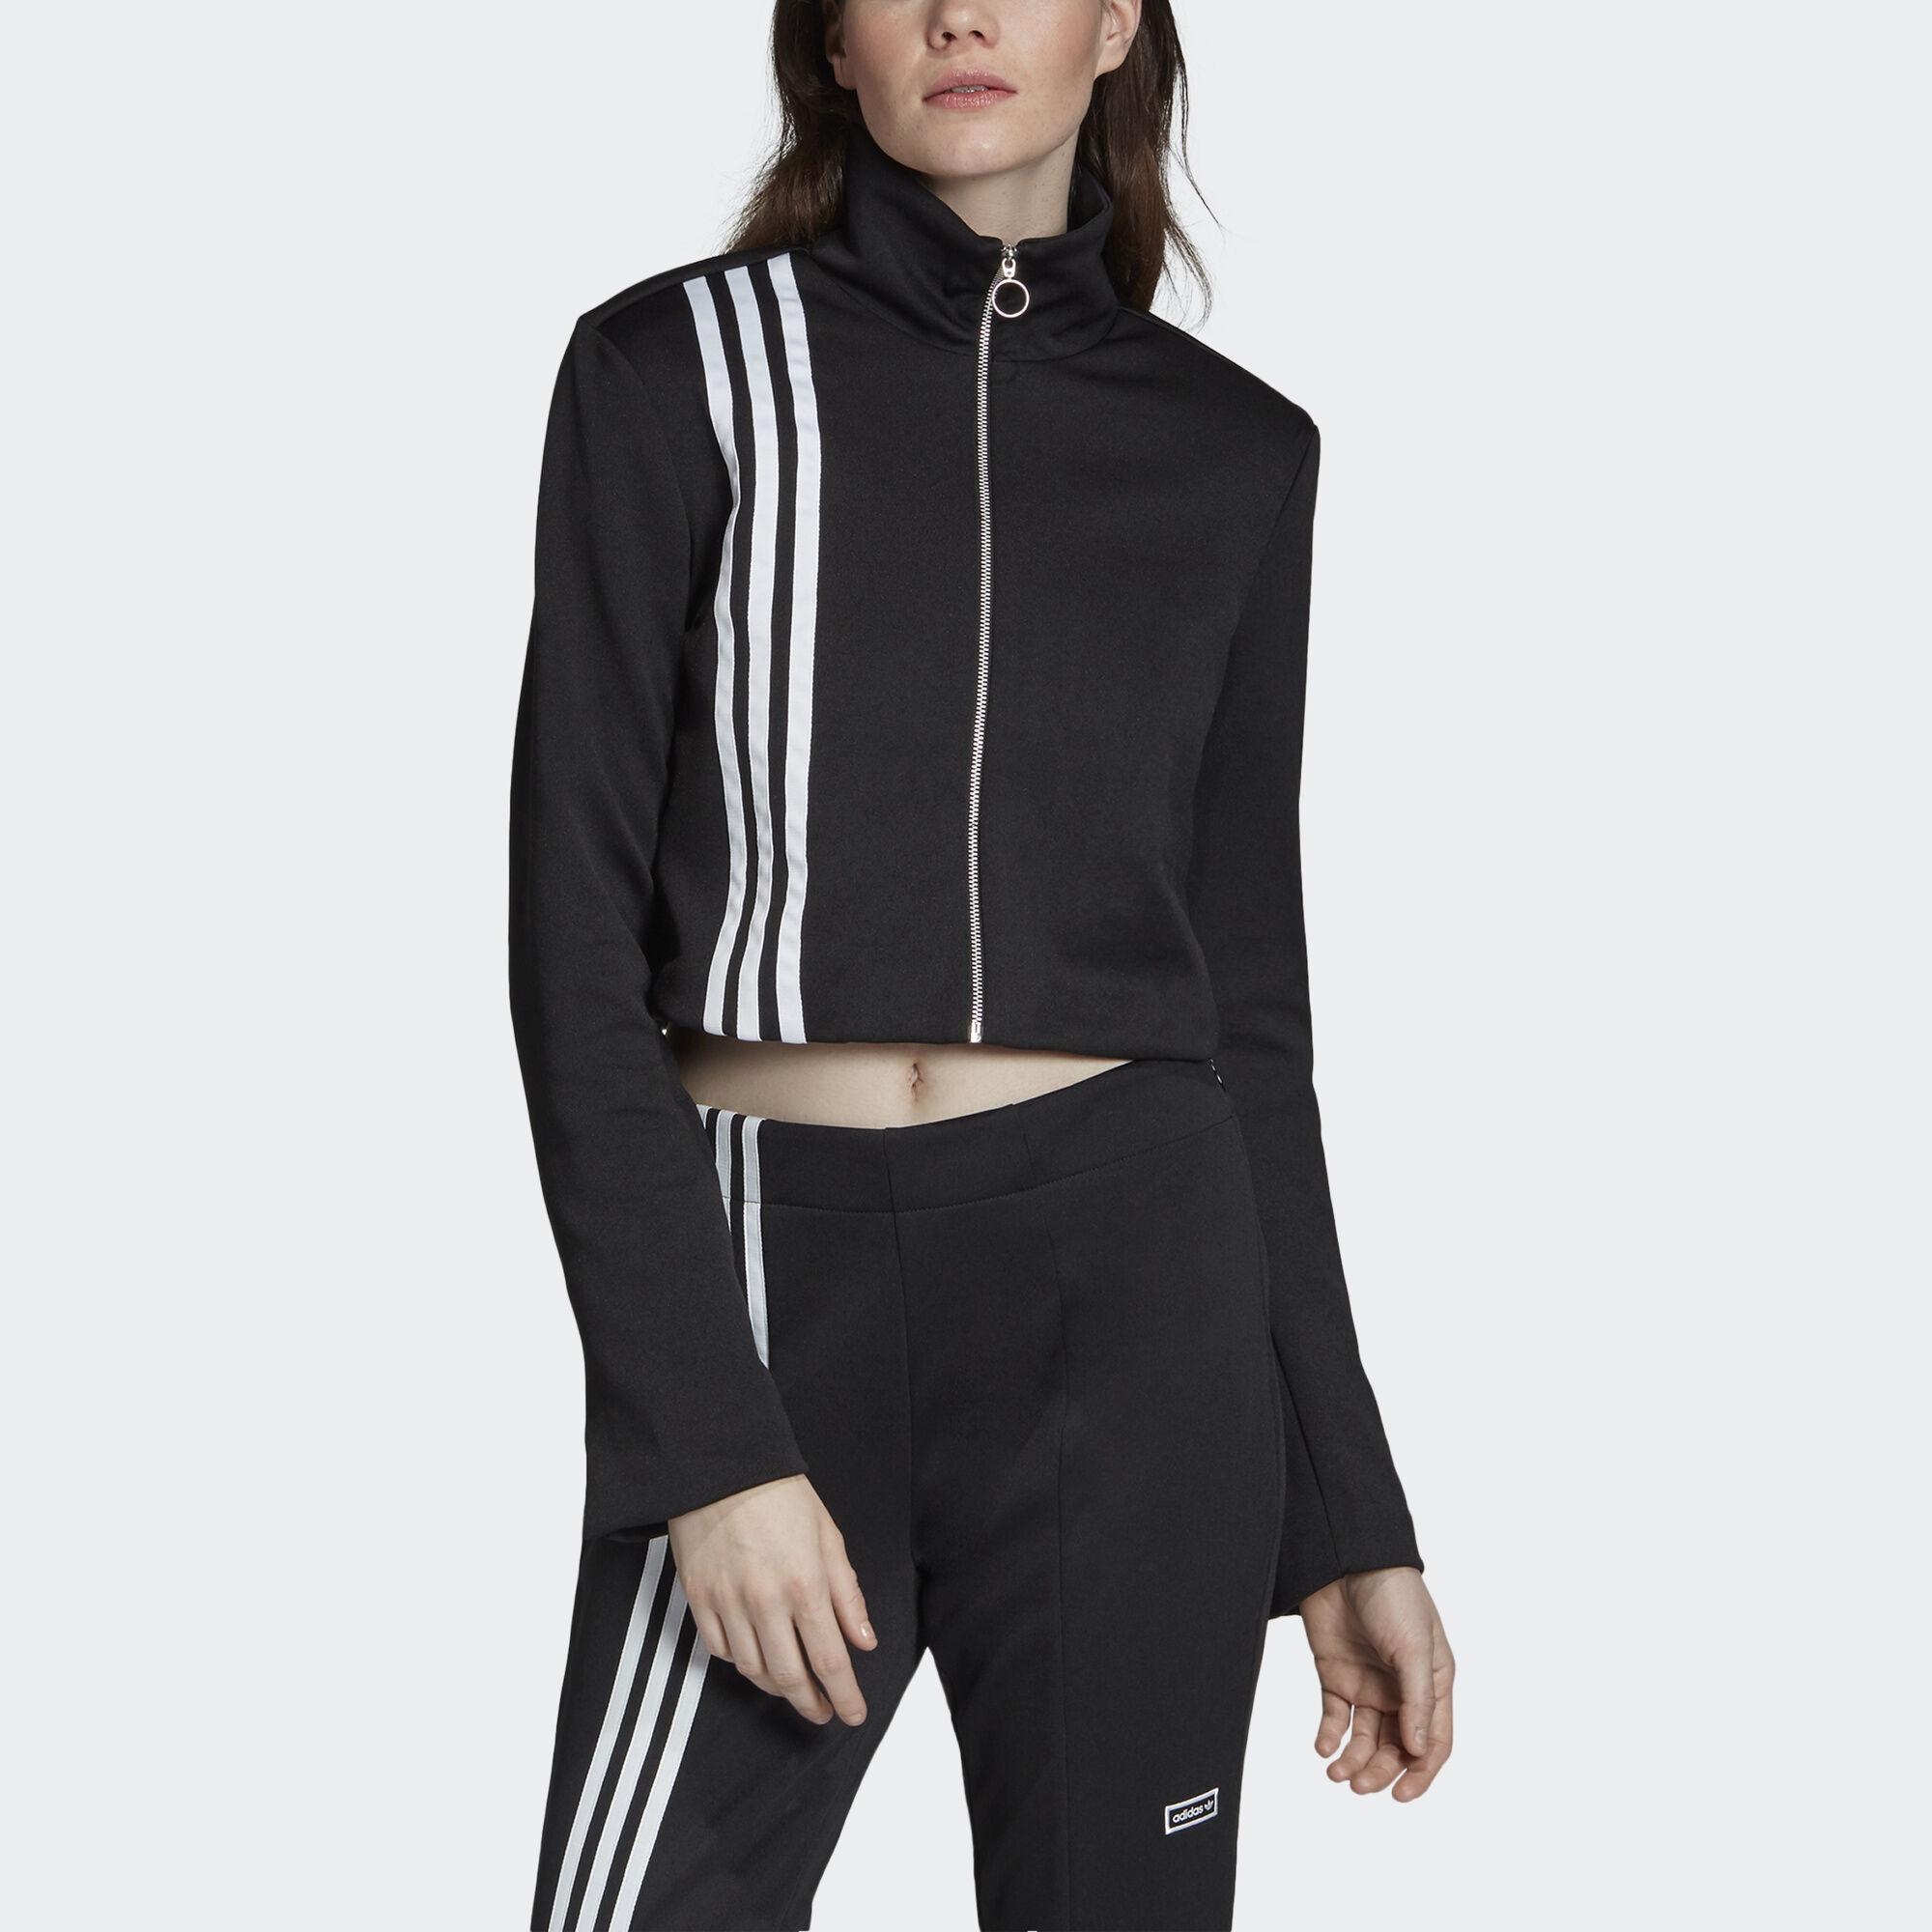 Adidas Bellista Allover Print Originals Jacke Mehrfarbig